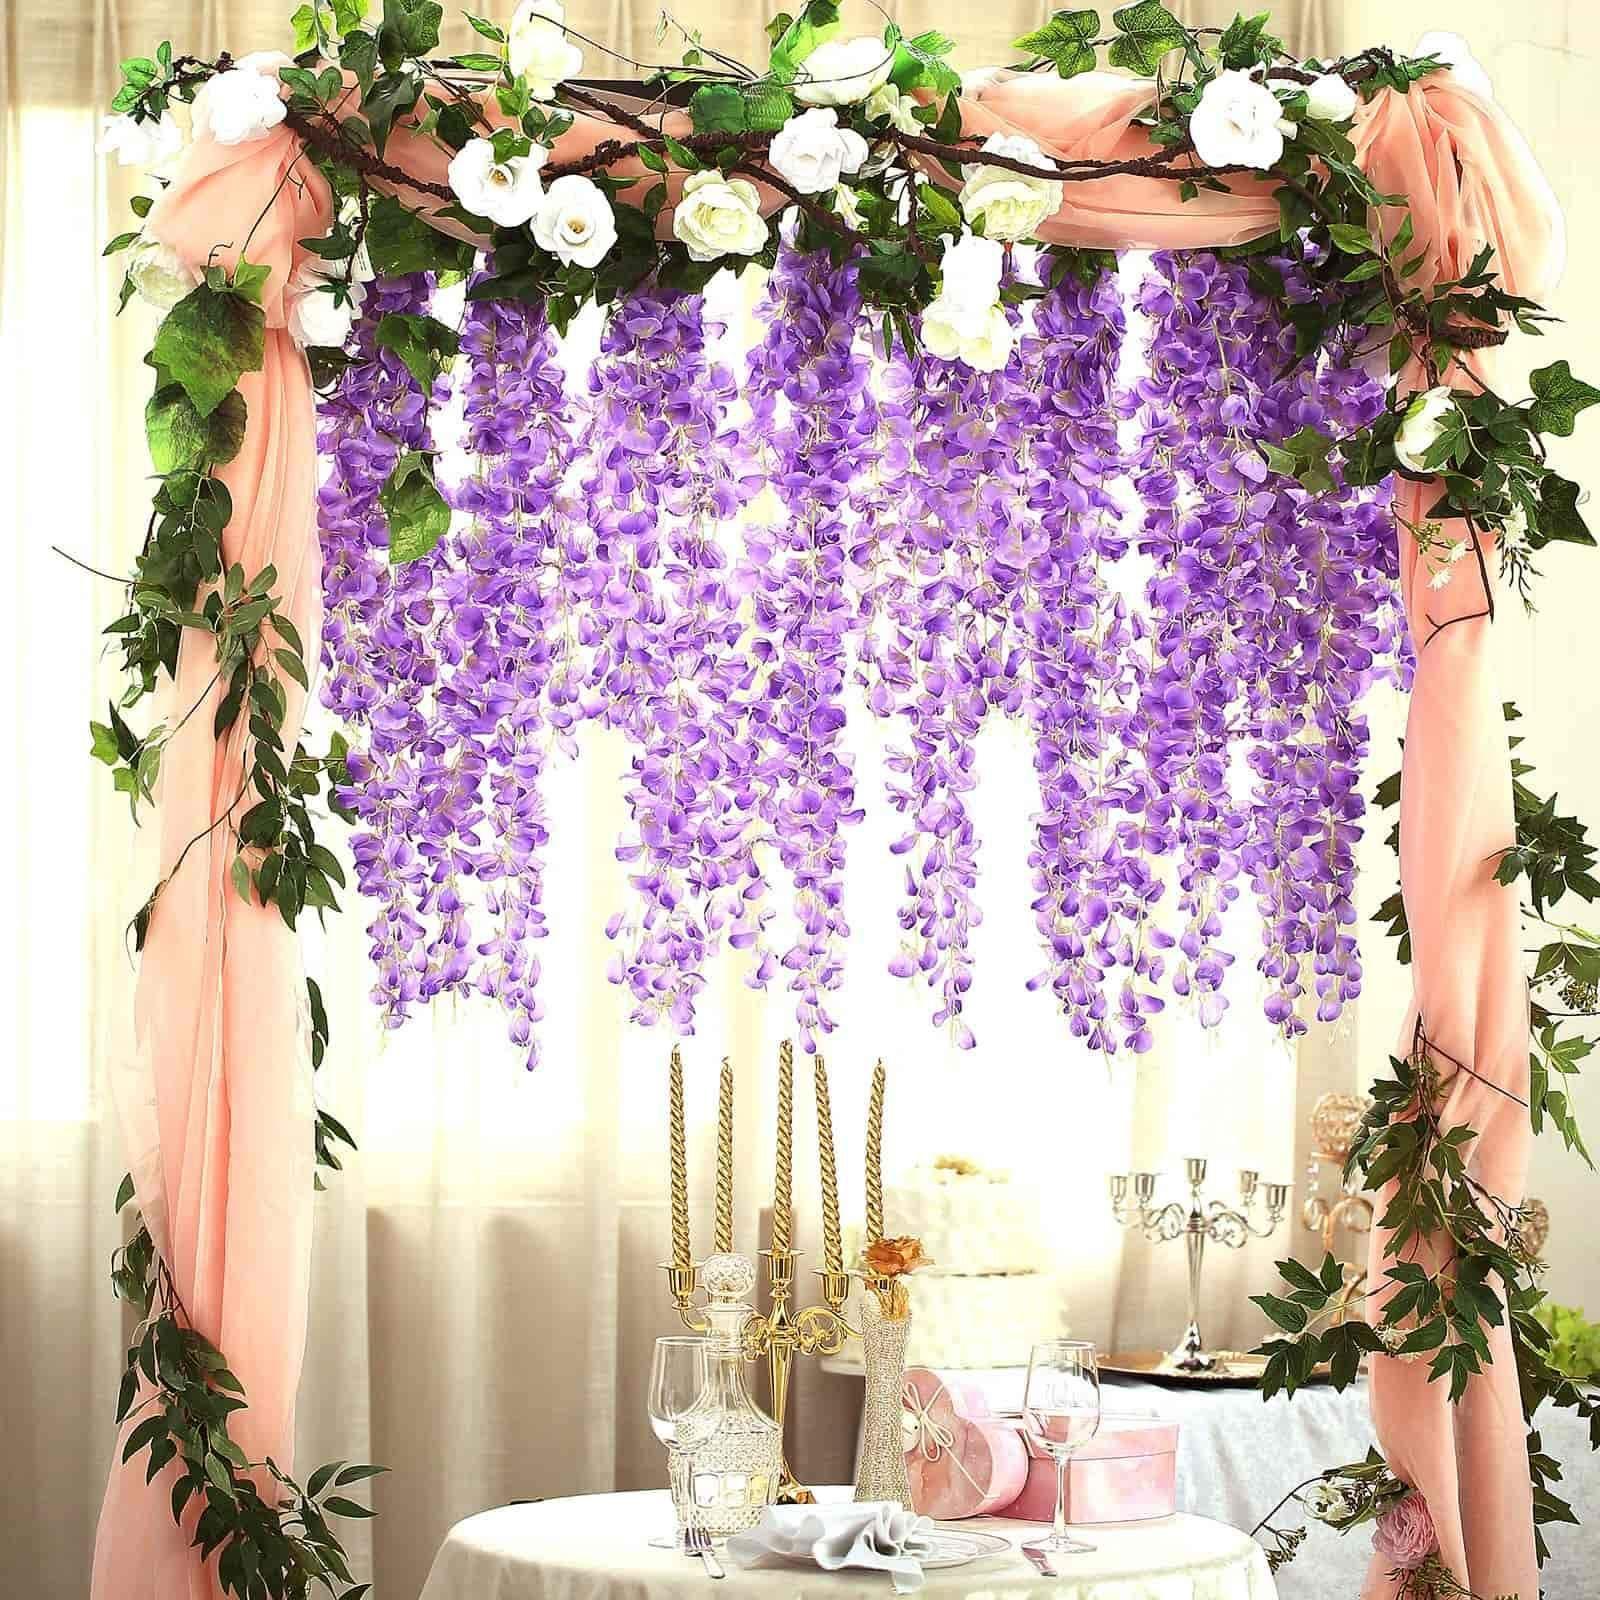 42 Lavender Artificial Wisteria Vine Silk Hanging Flower Garland In 2020 Flowering Vines Artificial Silk Flowers Flower Garlands